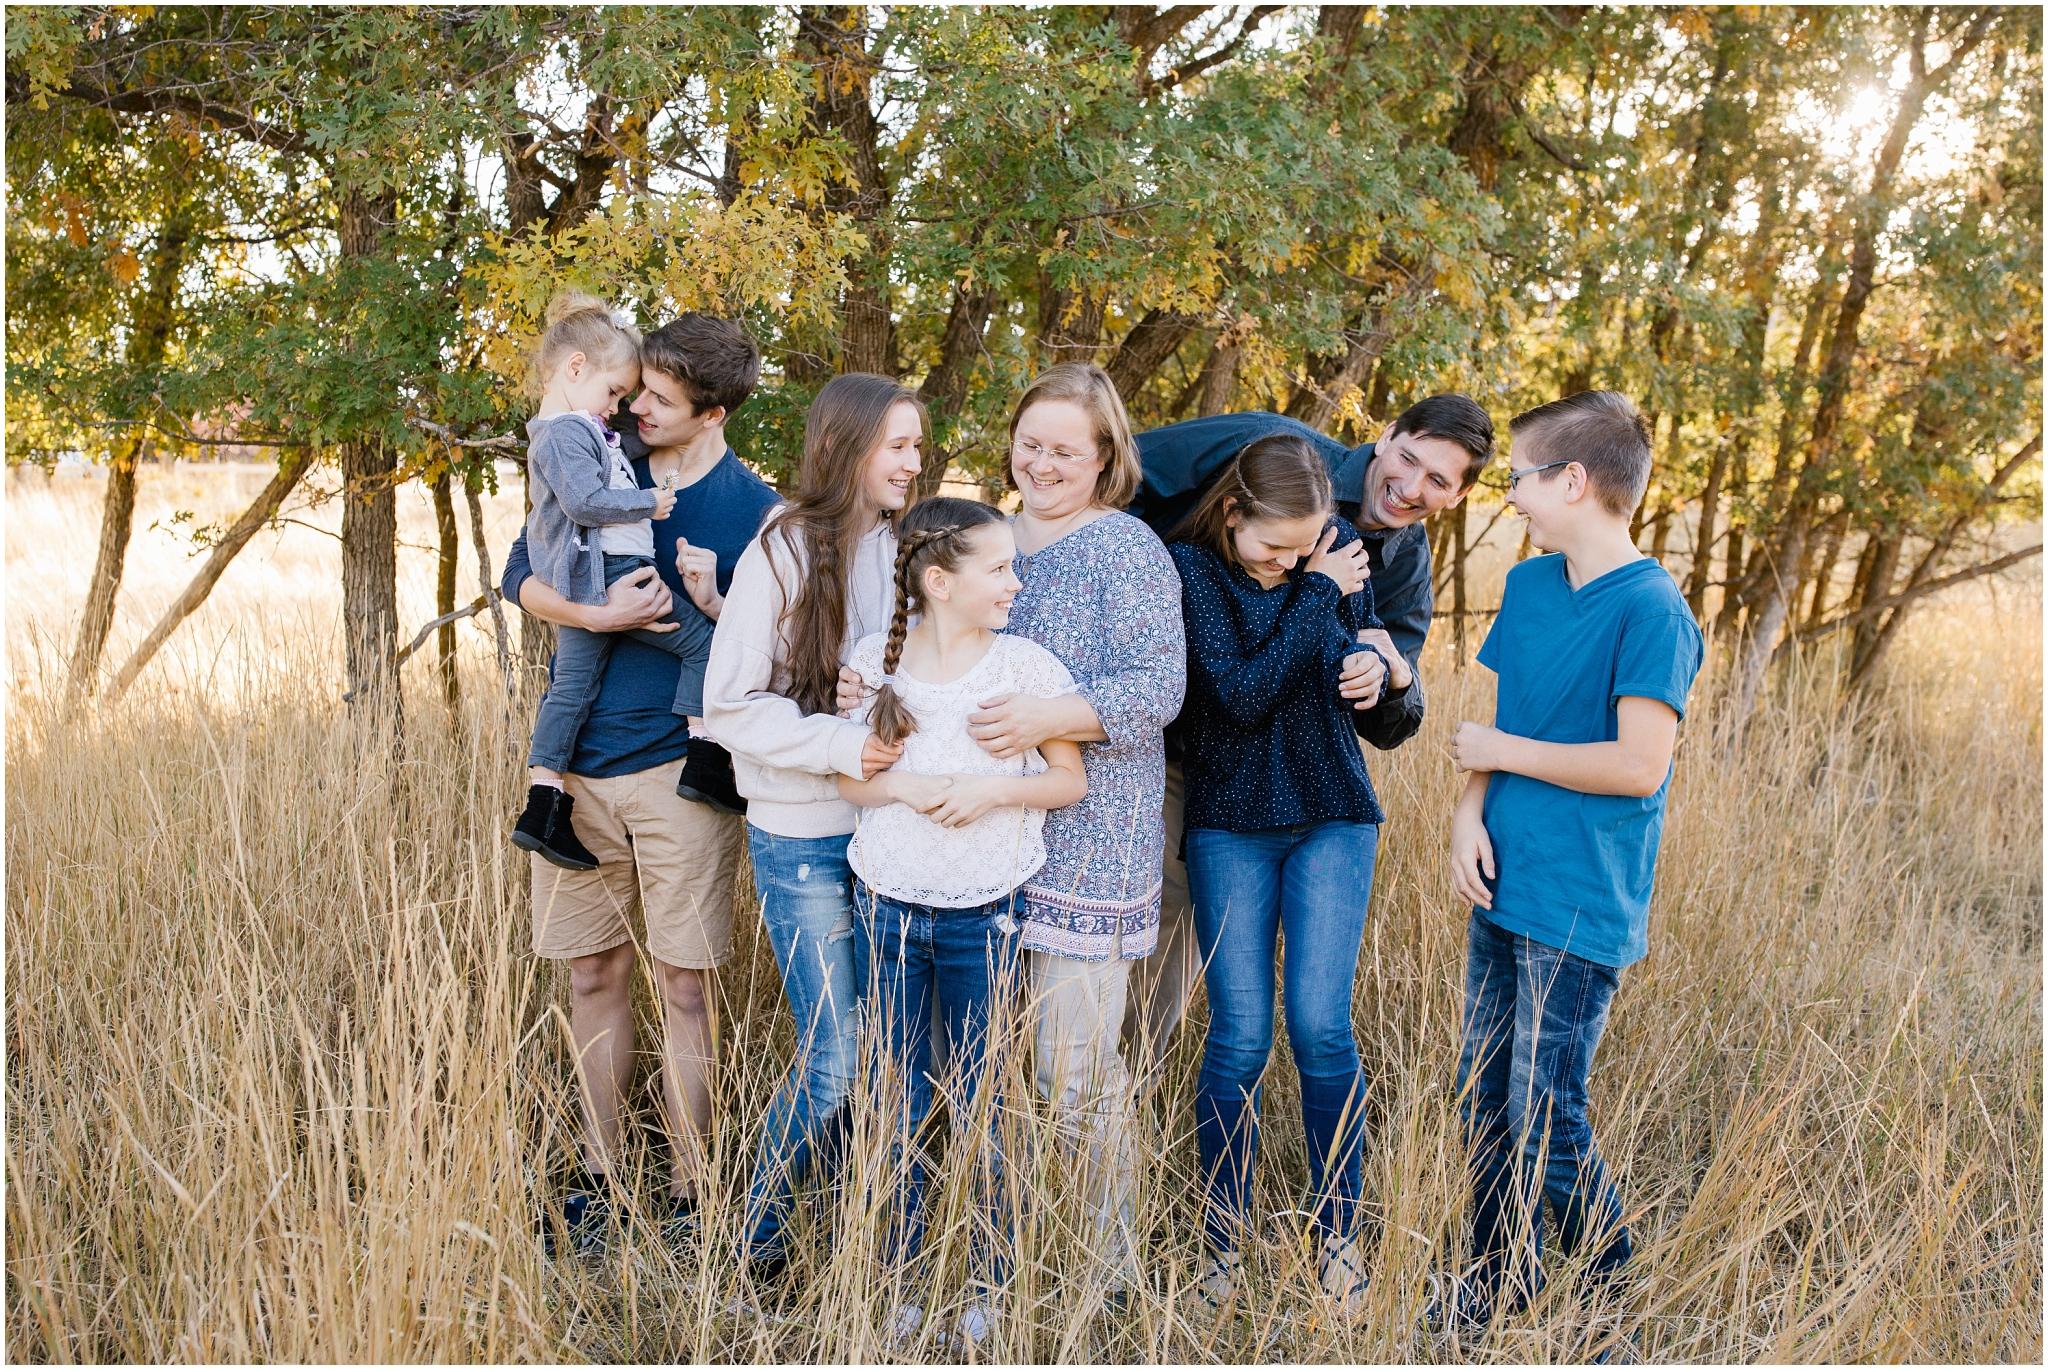 Jaursch-10_Lizzie-B-Imagery-Utah-Family-Photographer-Salt-Lake-City-Park-City-Herriman-Utah-County.jpg